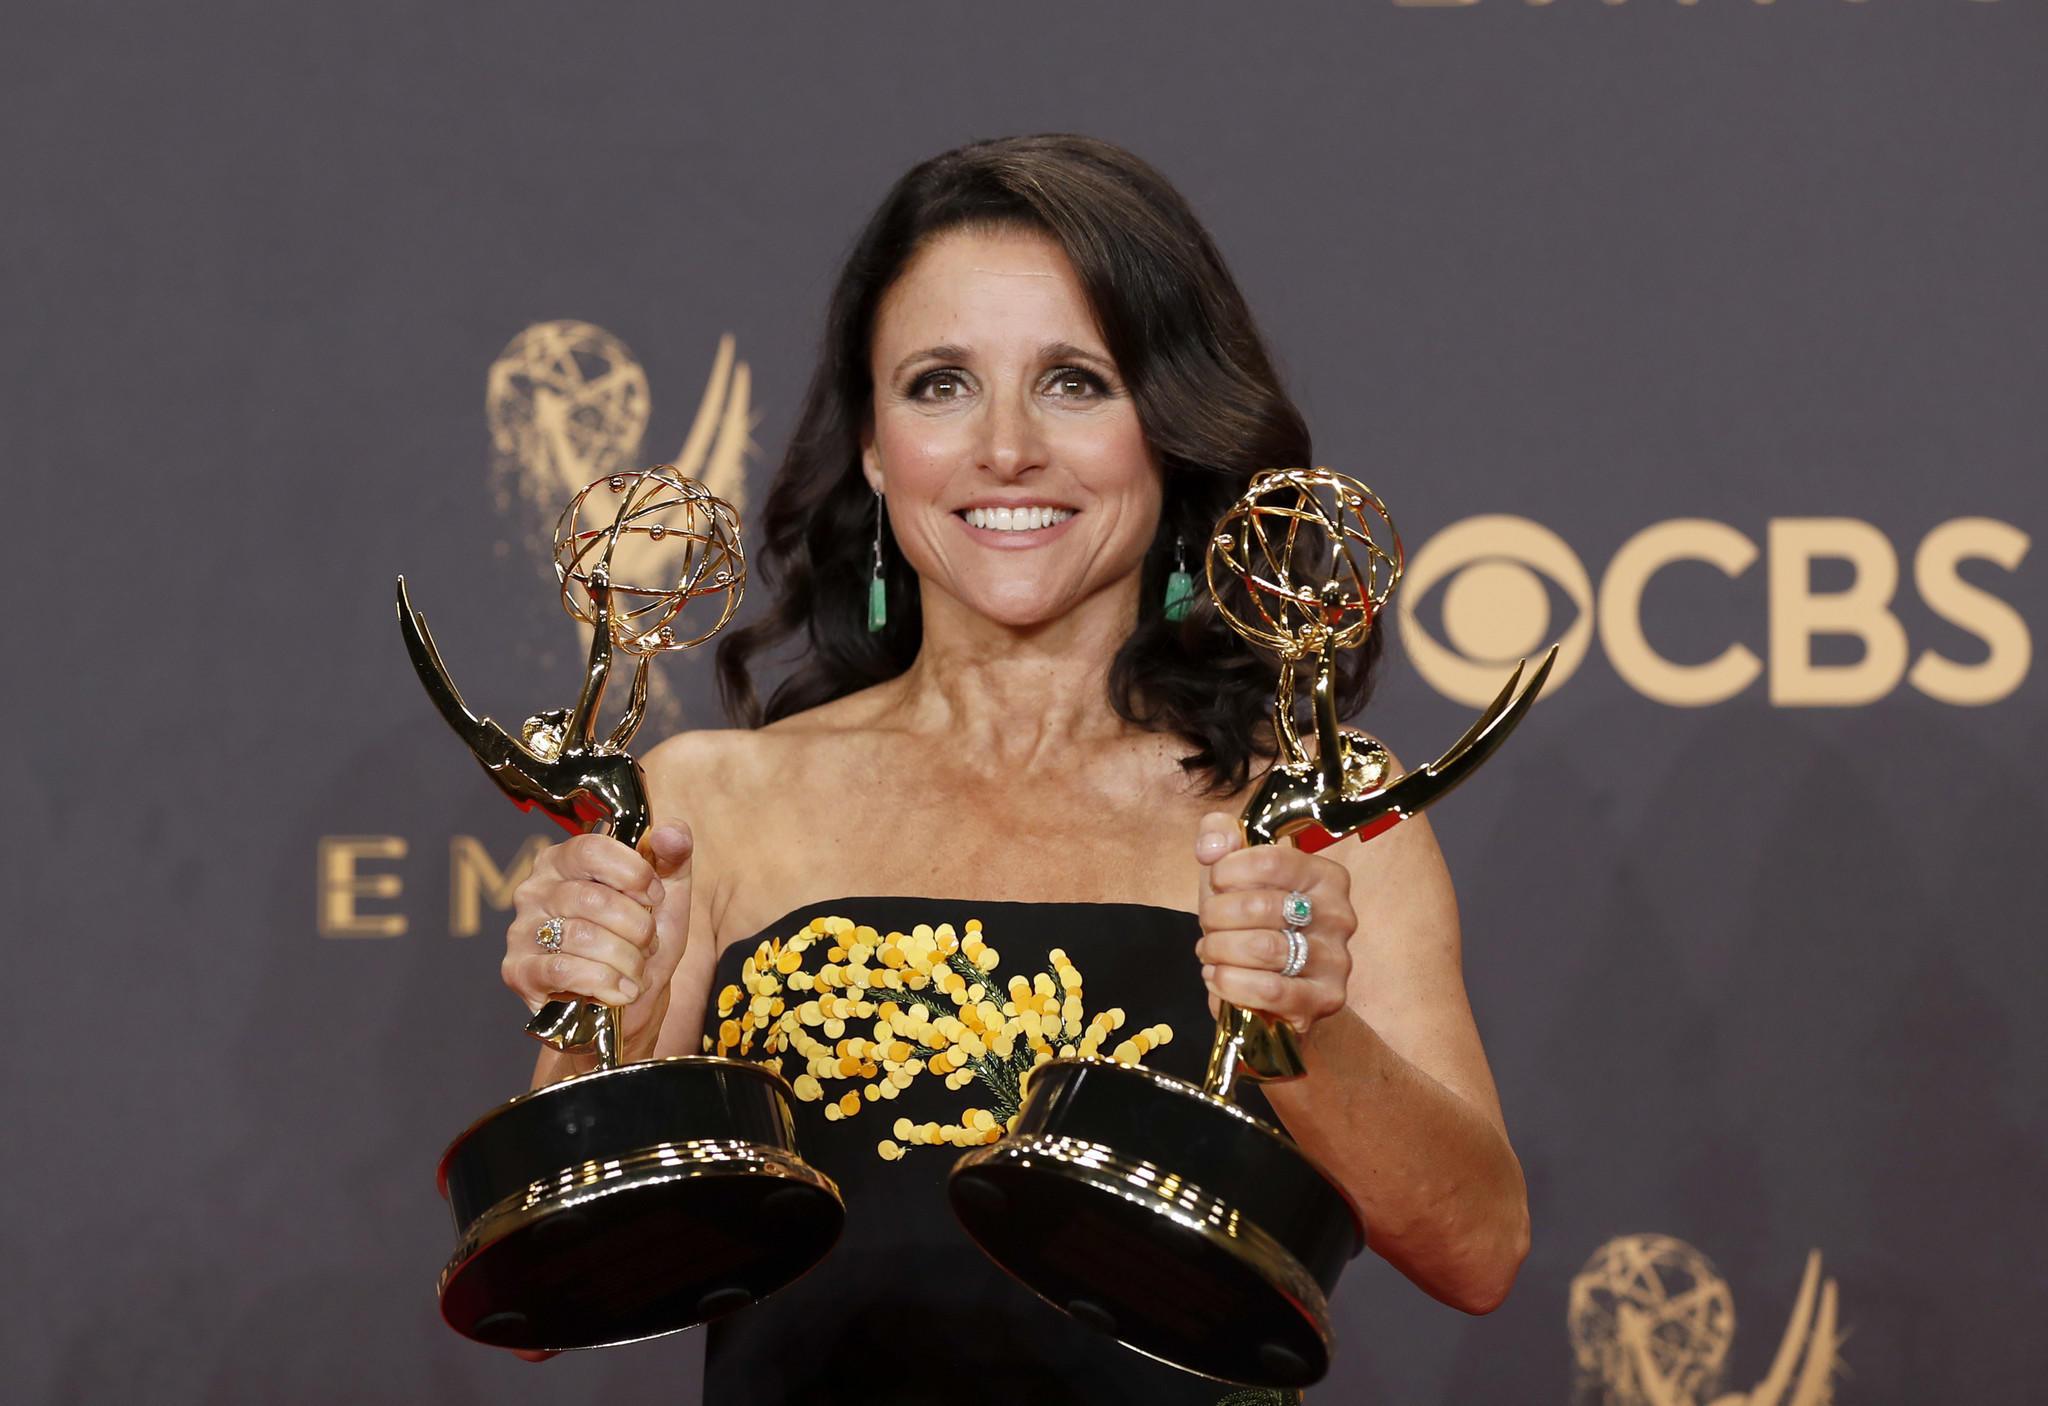 Emmy Awards 2017: Backstage with the winners - LA Times Emmy Winners